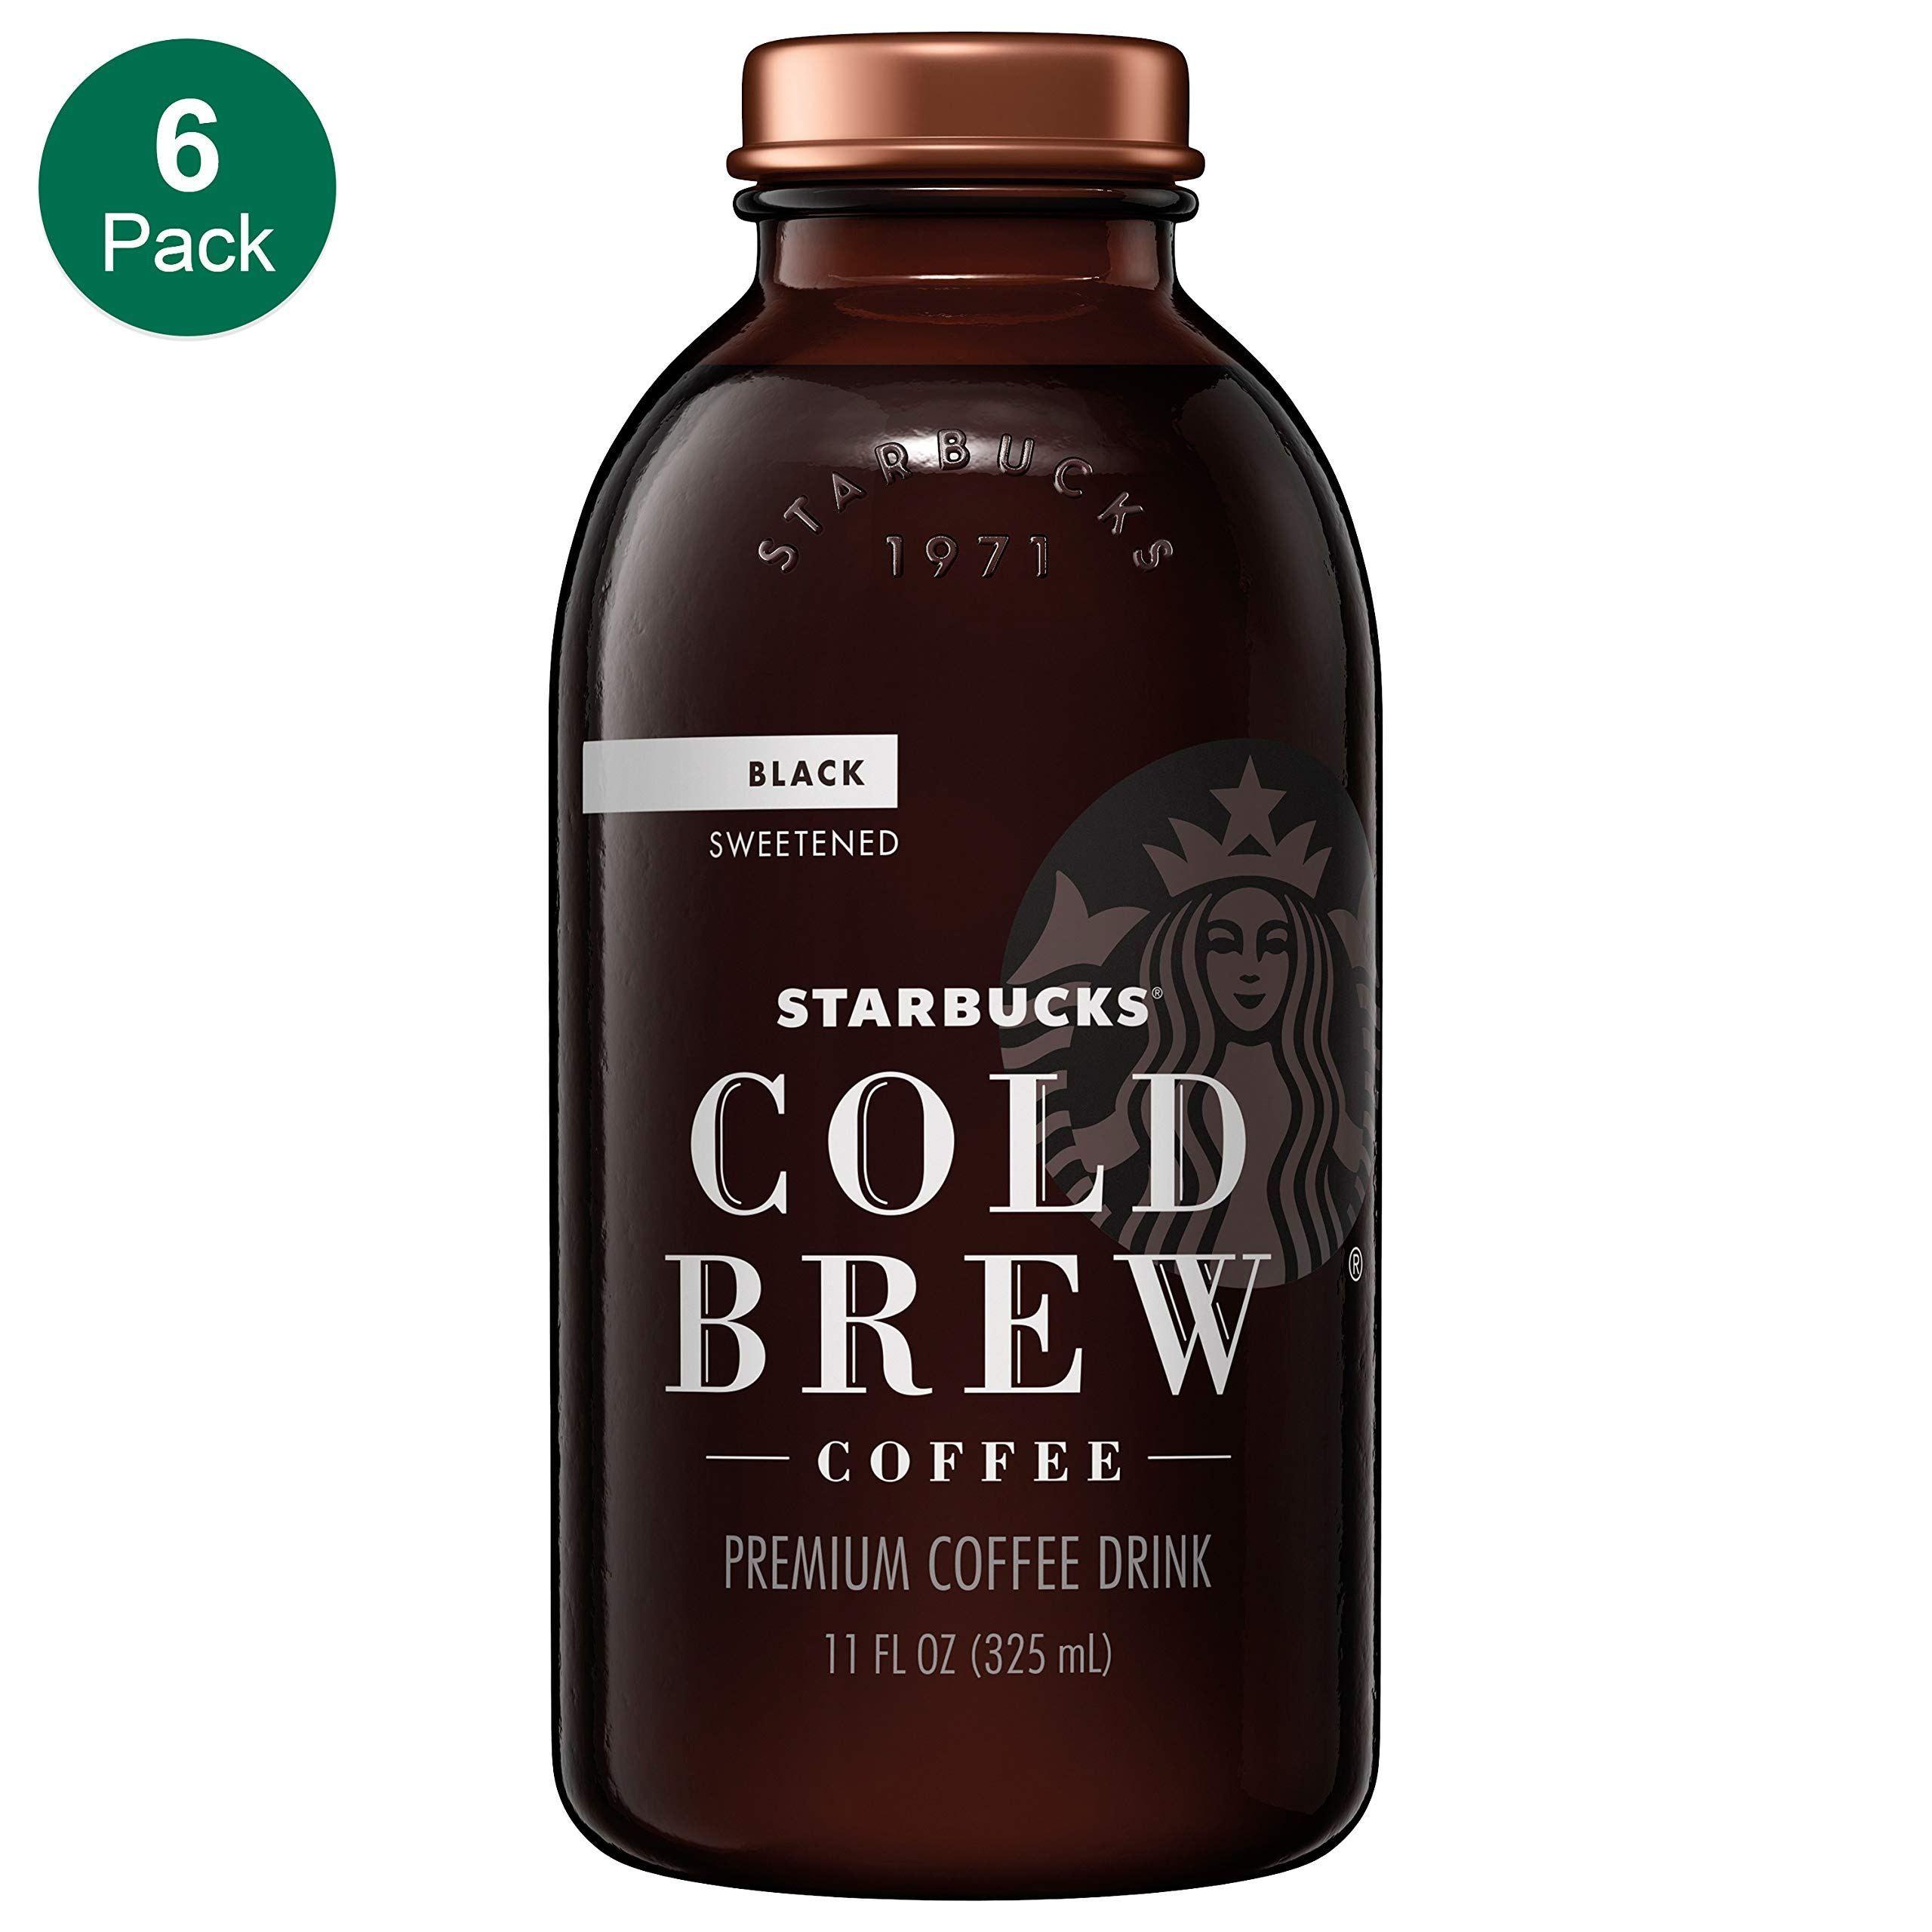 Starbucks Cold Brew Coffee, Black Unsweetened, 11 oz Glass